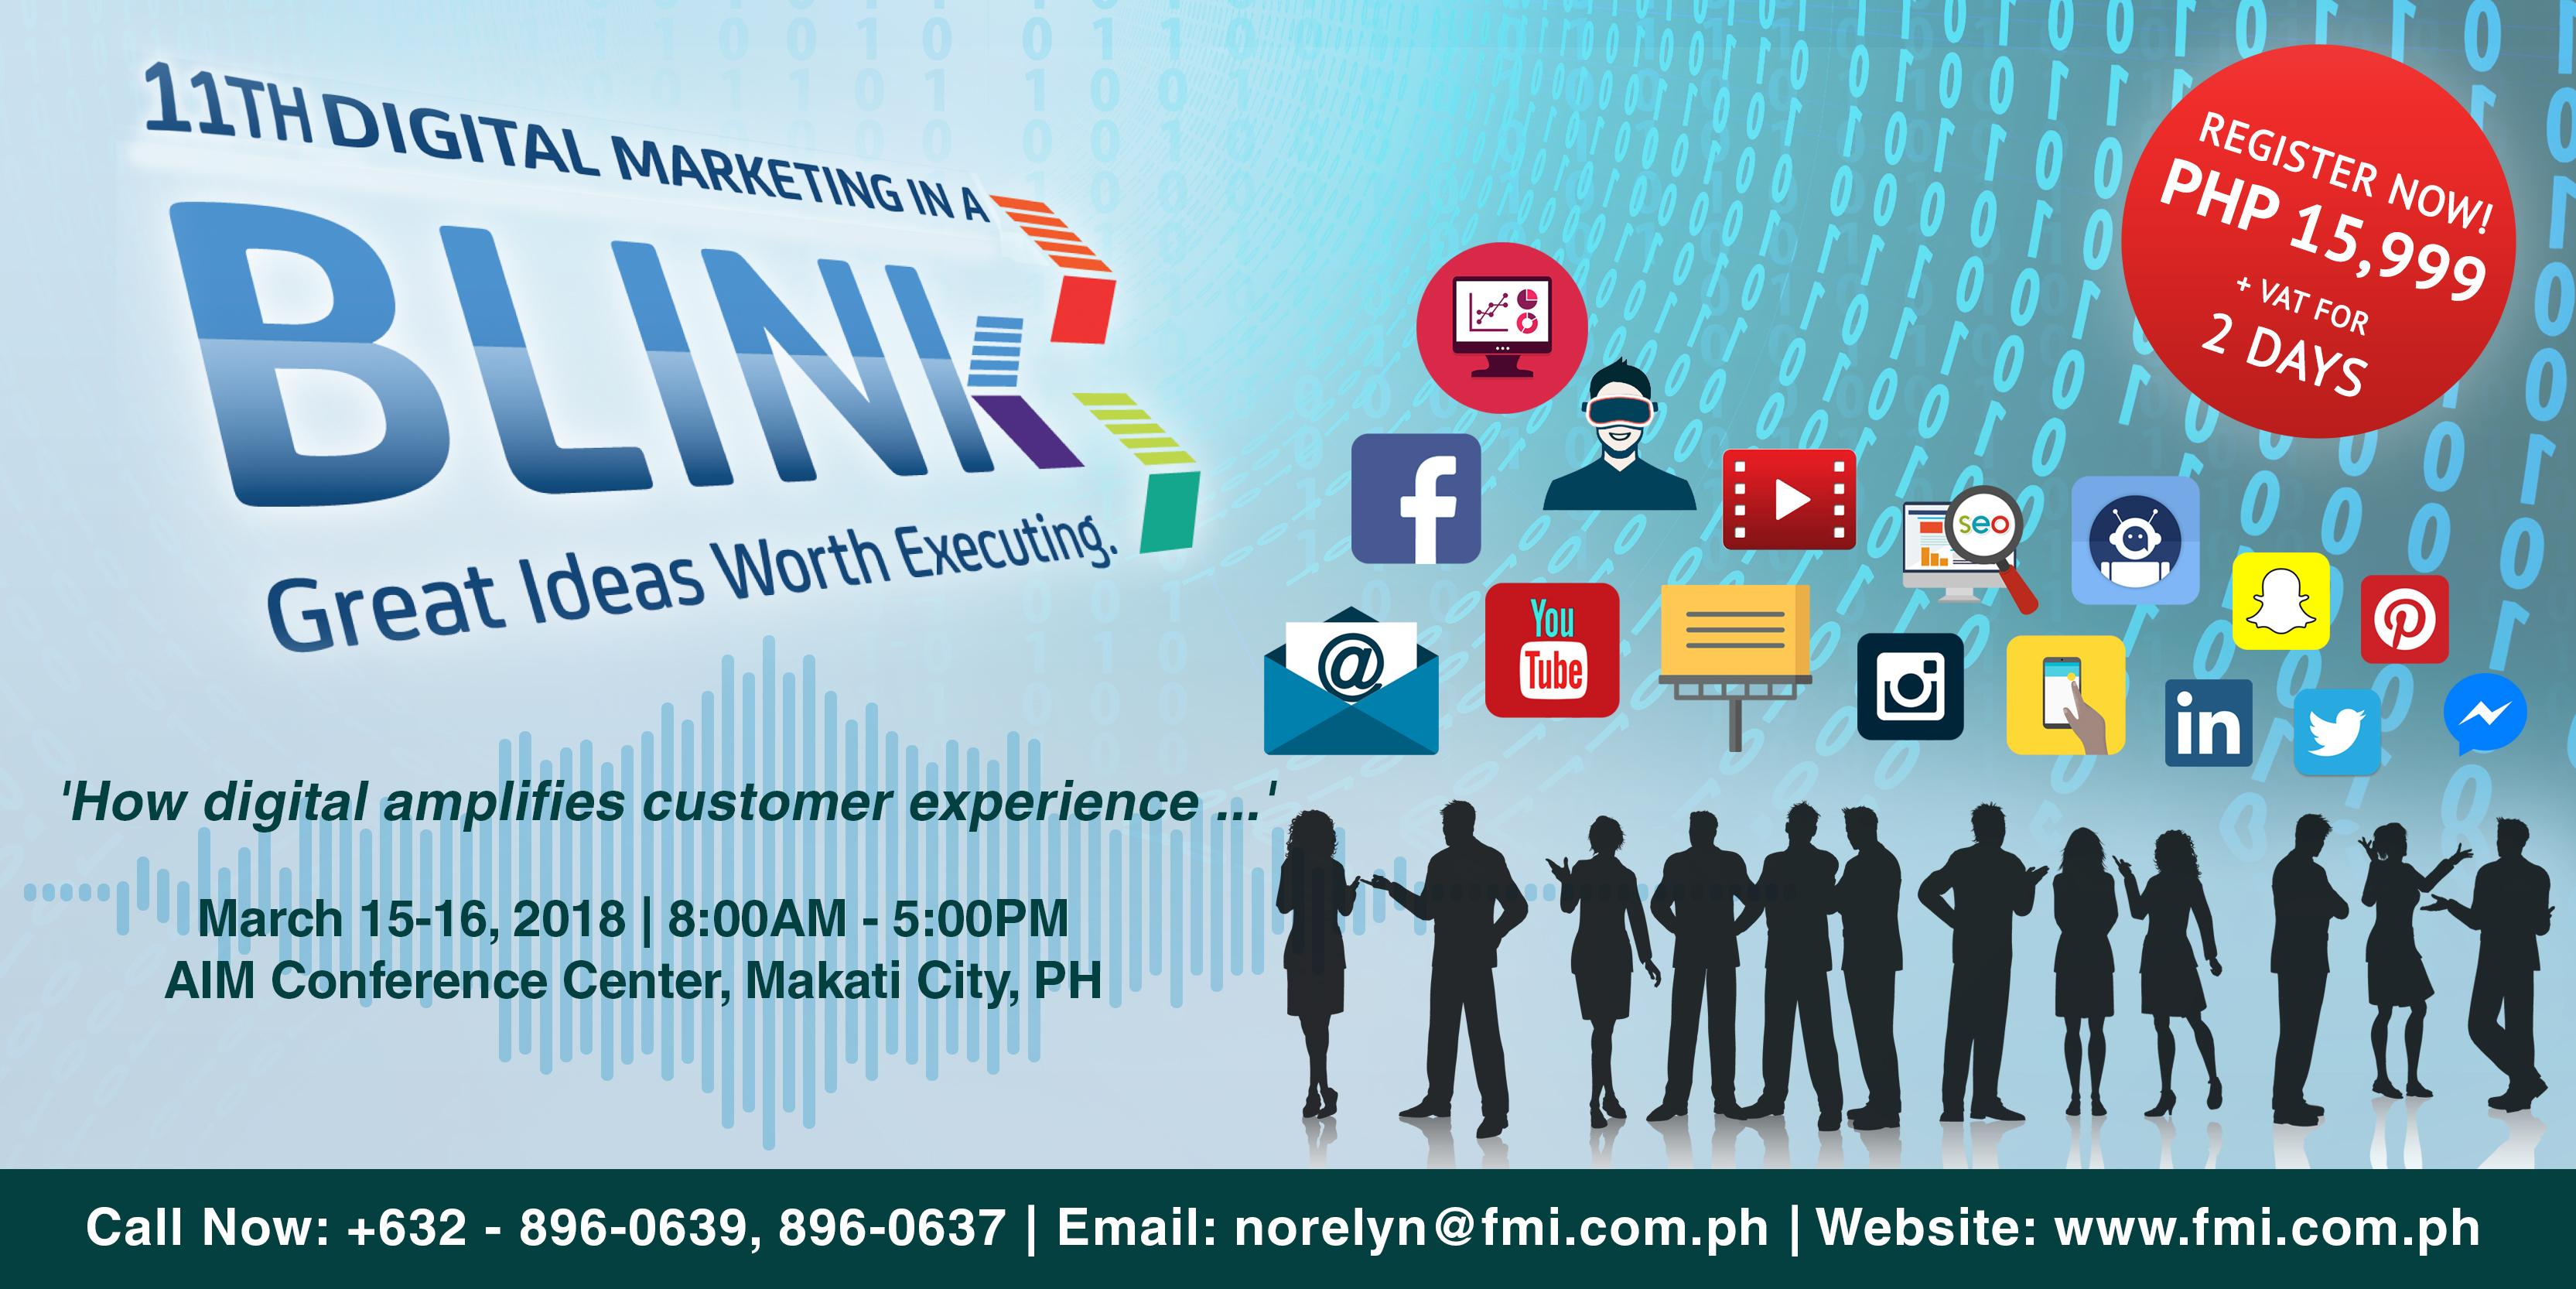 Digital Marketing In A BLINK Seminar 2018